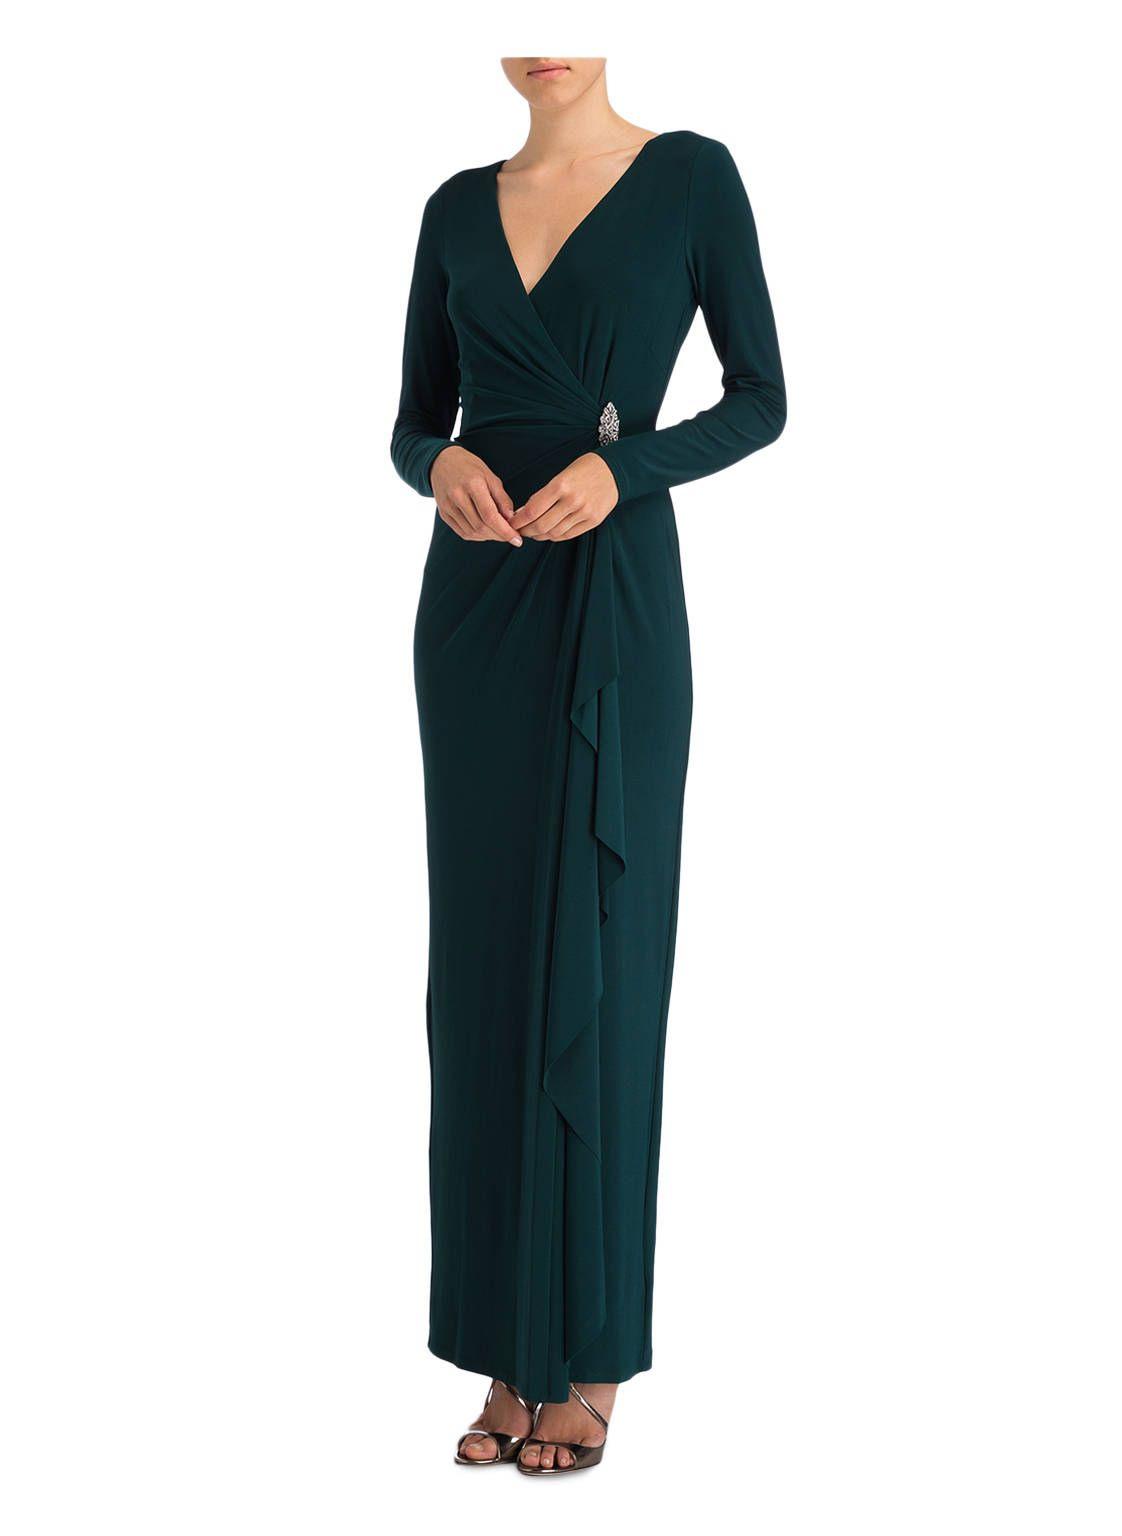 17 Kreativ Abendkleid Ralph Lauren Galerie10 Genial Abendkleid Ralph Lauren Vertrieb